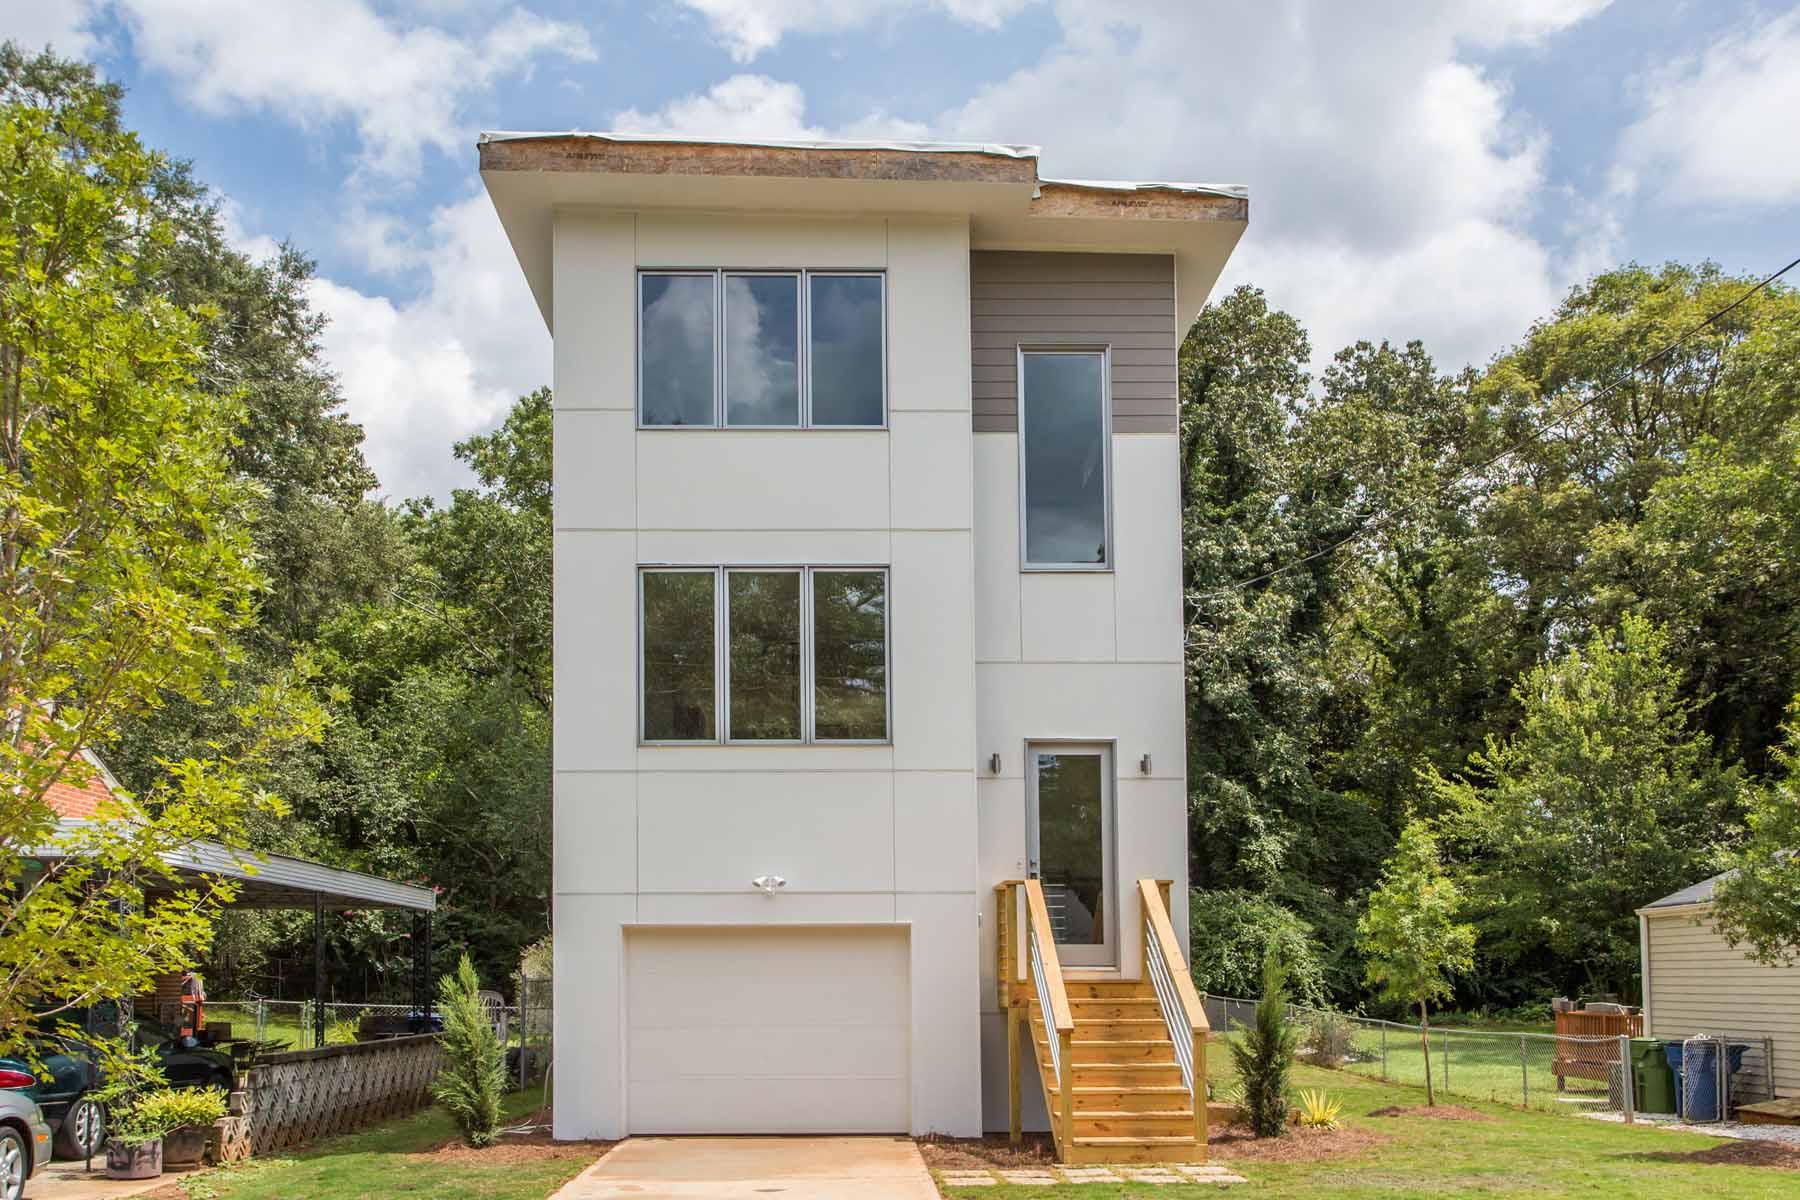 Частный односемейный дом для того Продажа на East Lake Modern 430 Hooper Street SE East Lake, Atlanta, Джорджия 30317 Соединенные Штаты